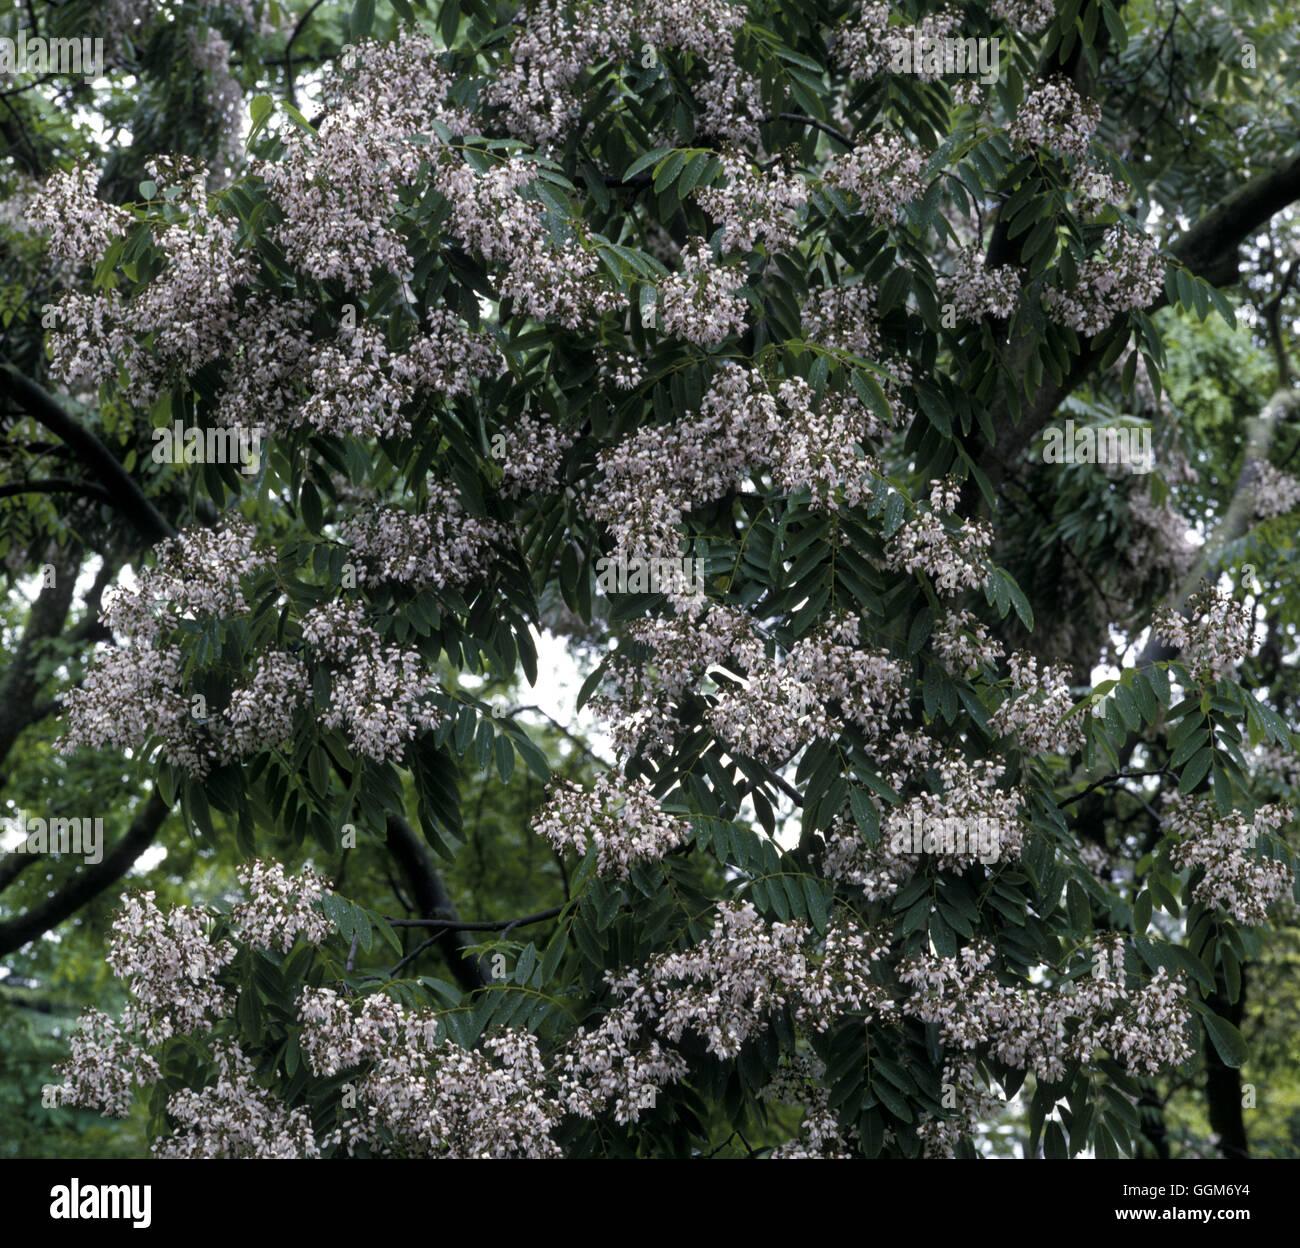 Cladrastis sinensis  Date: 23.06.08  TRS01221 - Stock Image